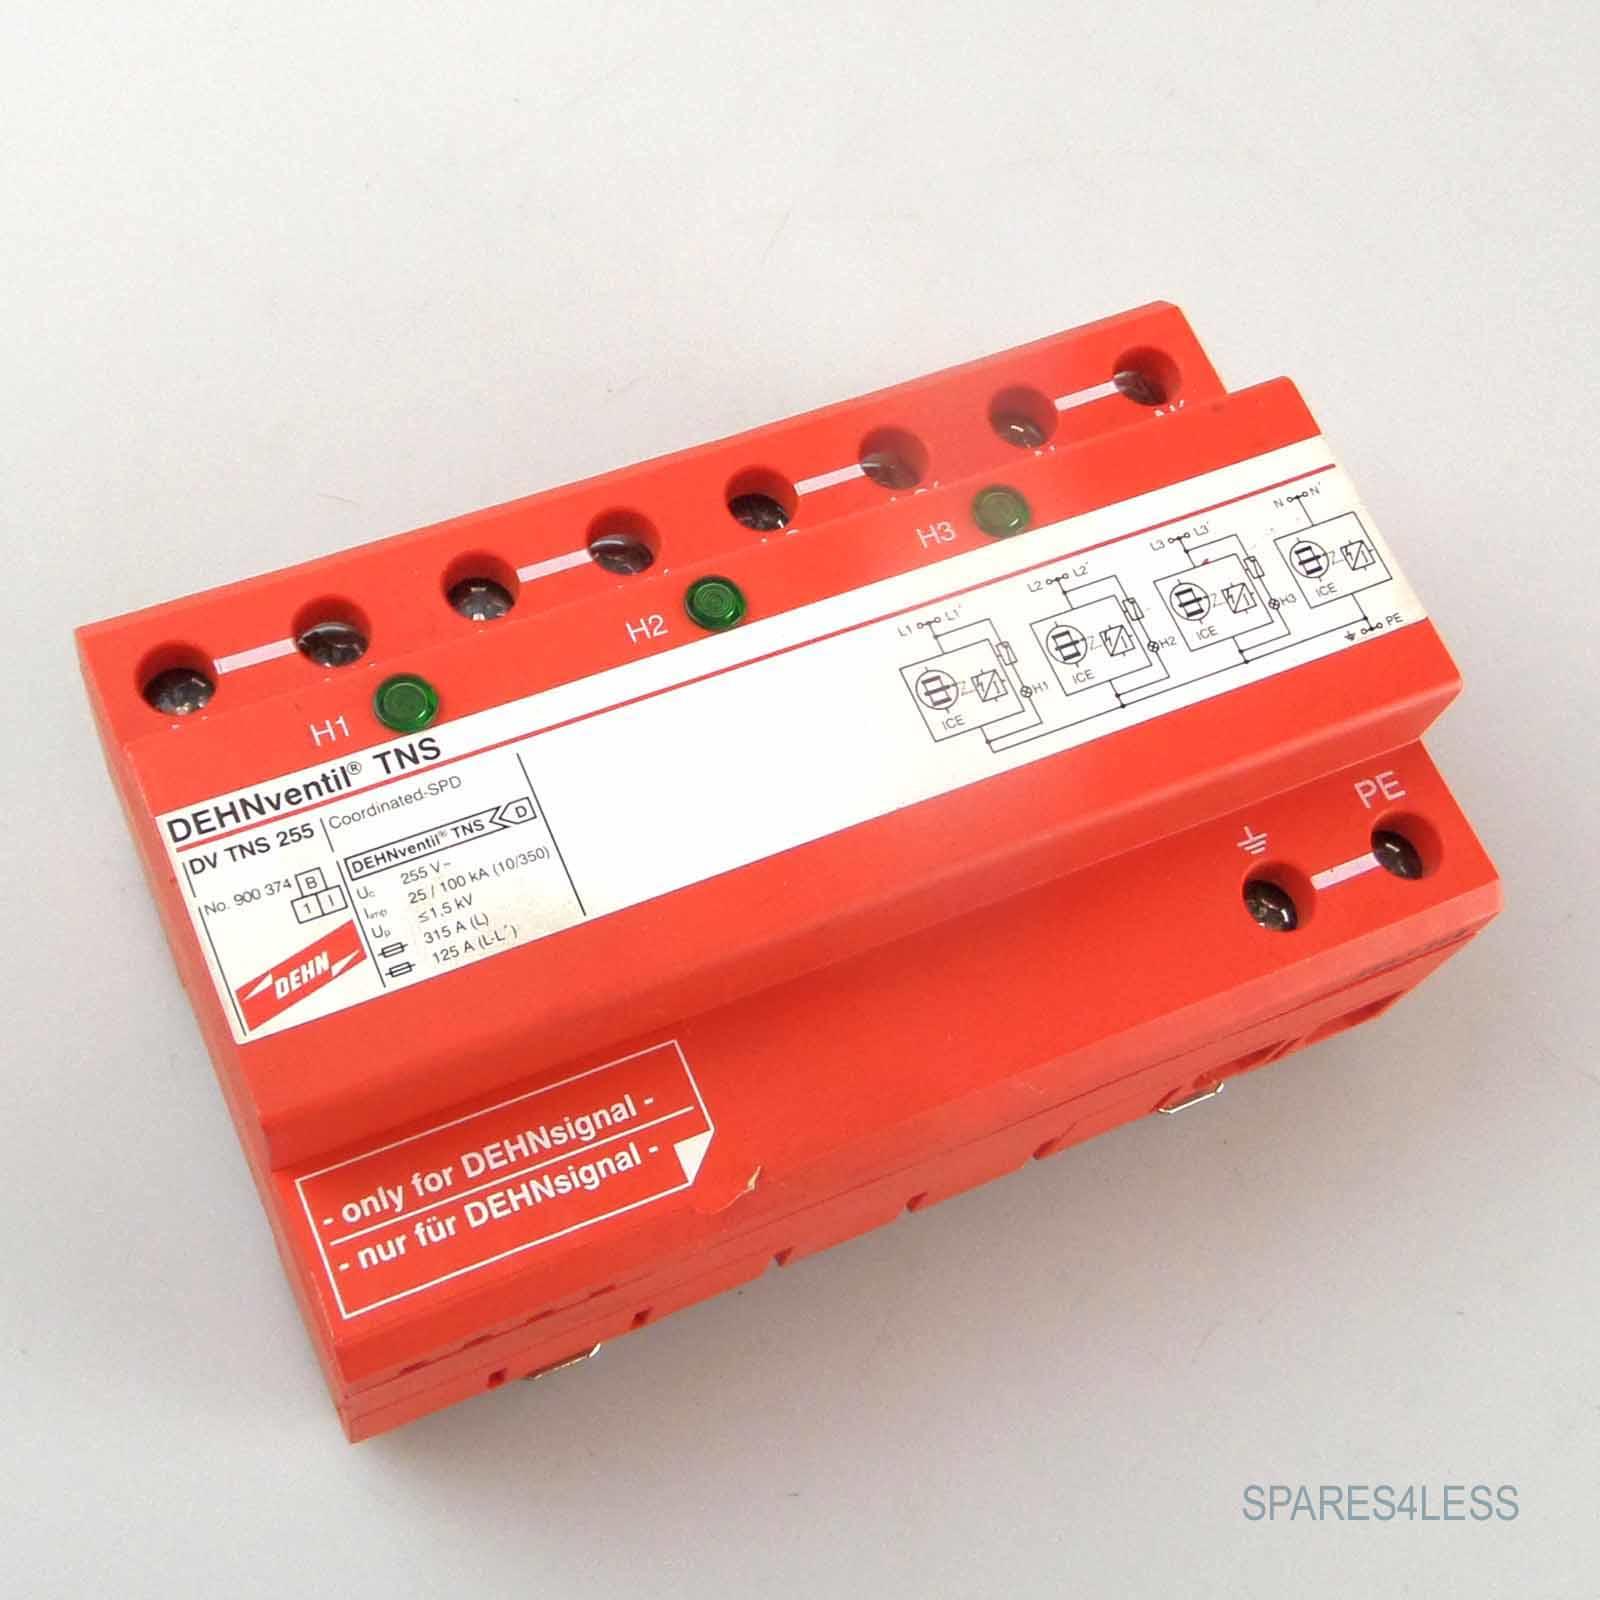 DEHN DV TNS 255 - DEHNventil TNS Kombi-Ableiter - spares4less ...